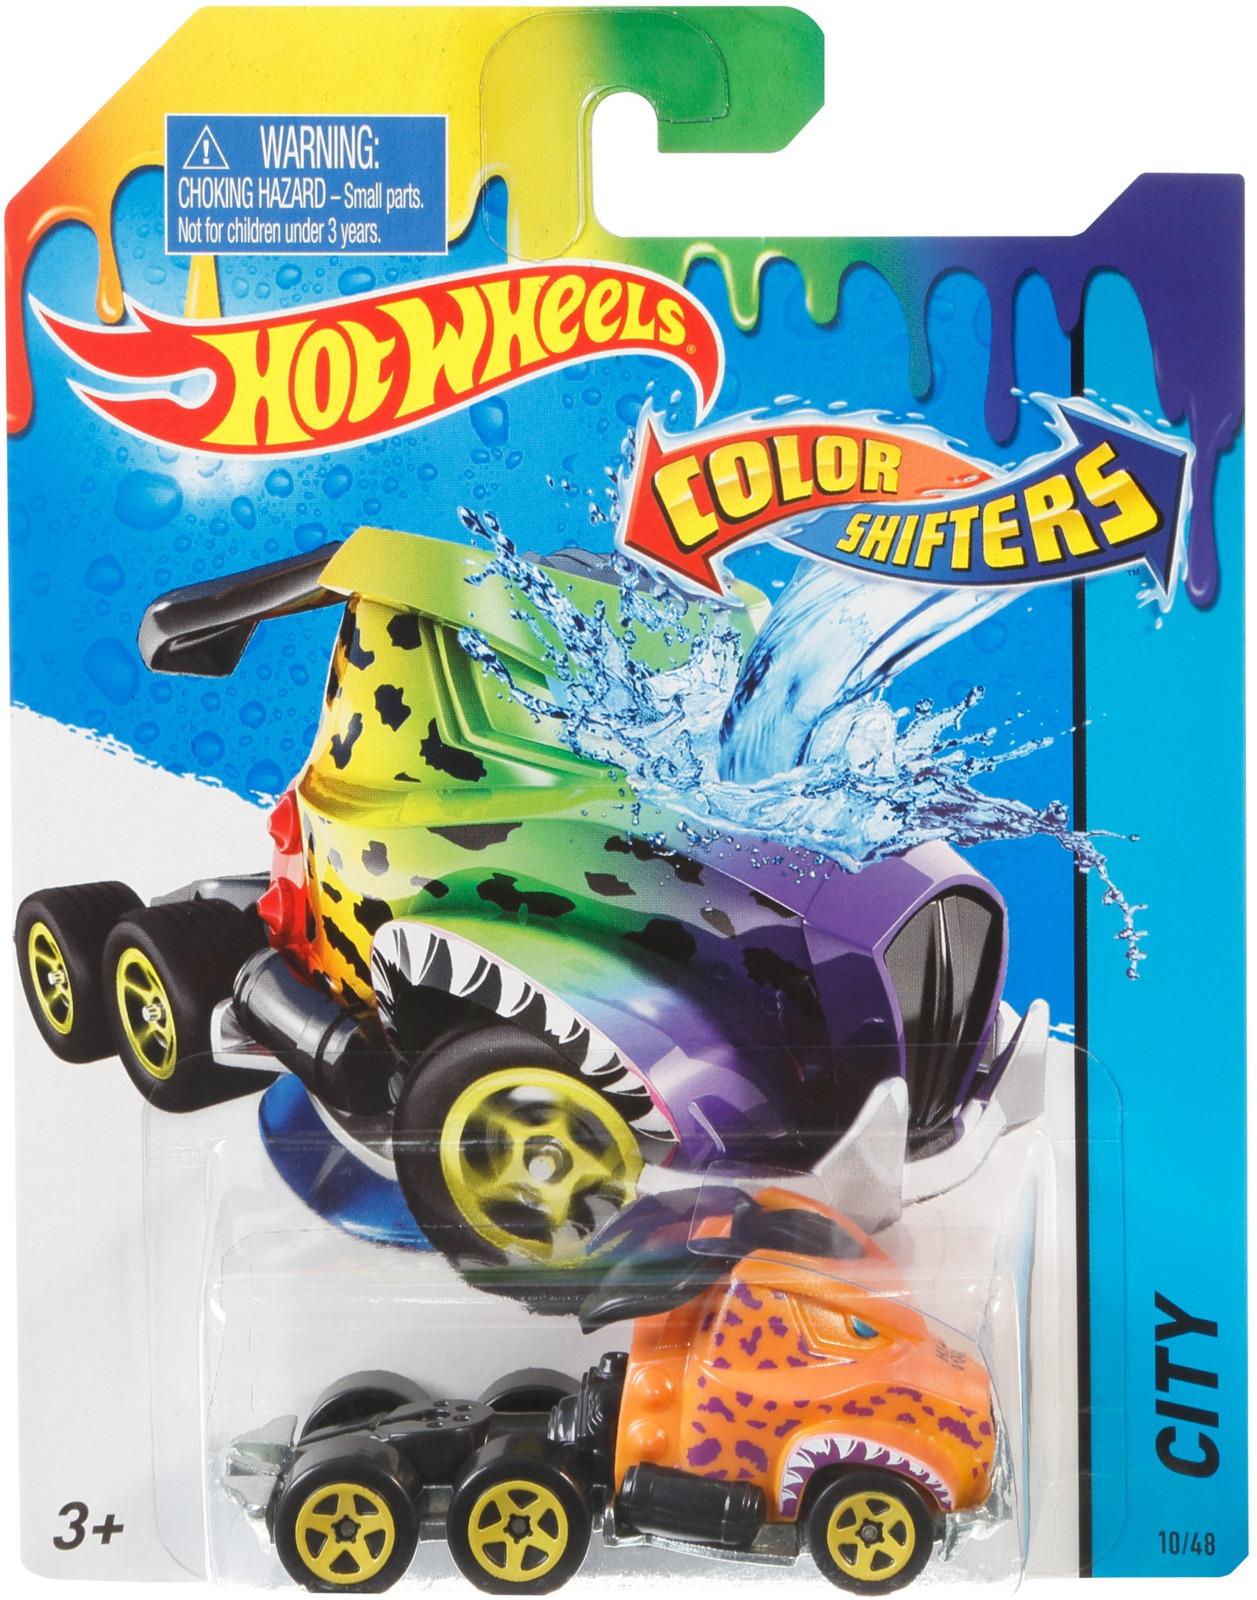 Машинка Hot Wheels Color Shifters hot wheels color shifters машинка what 4 2